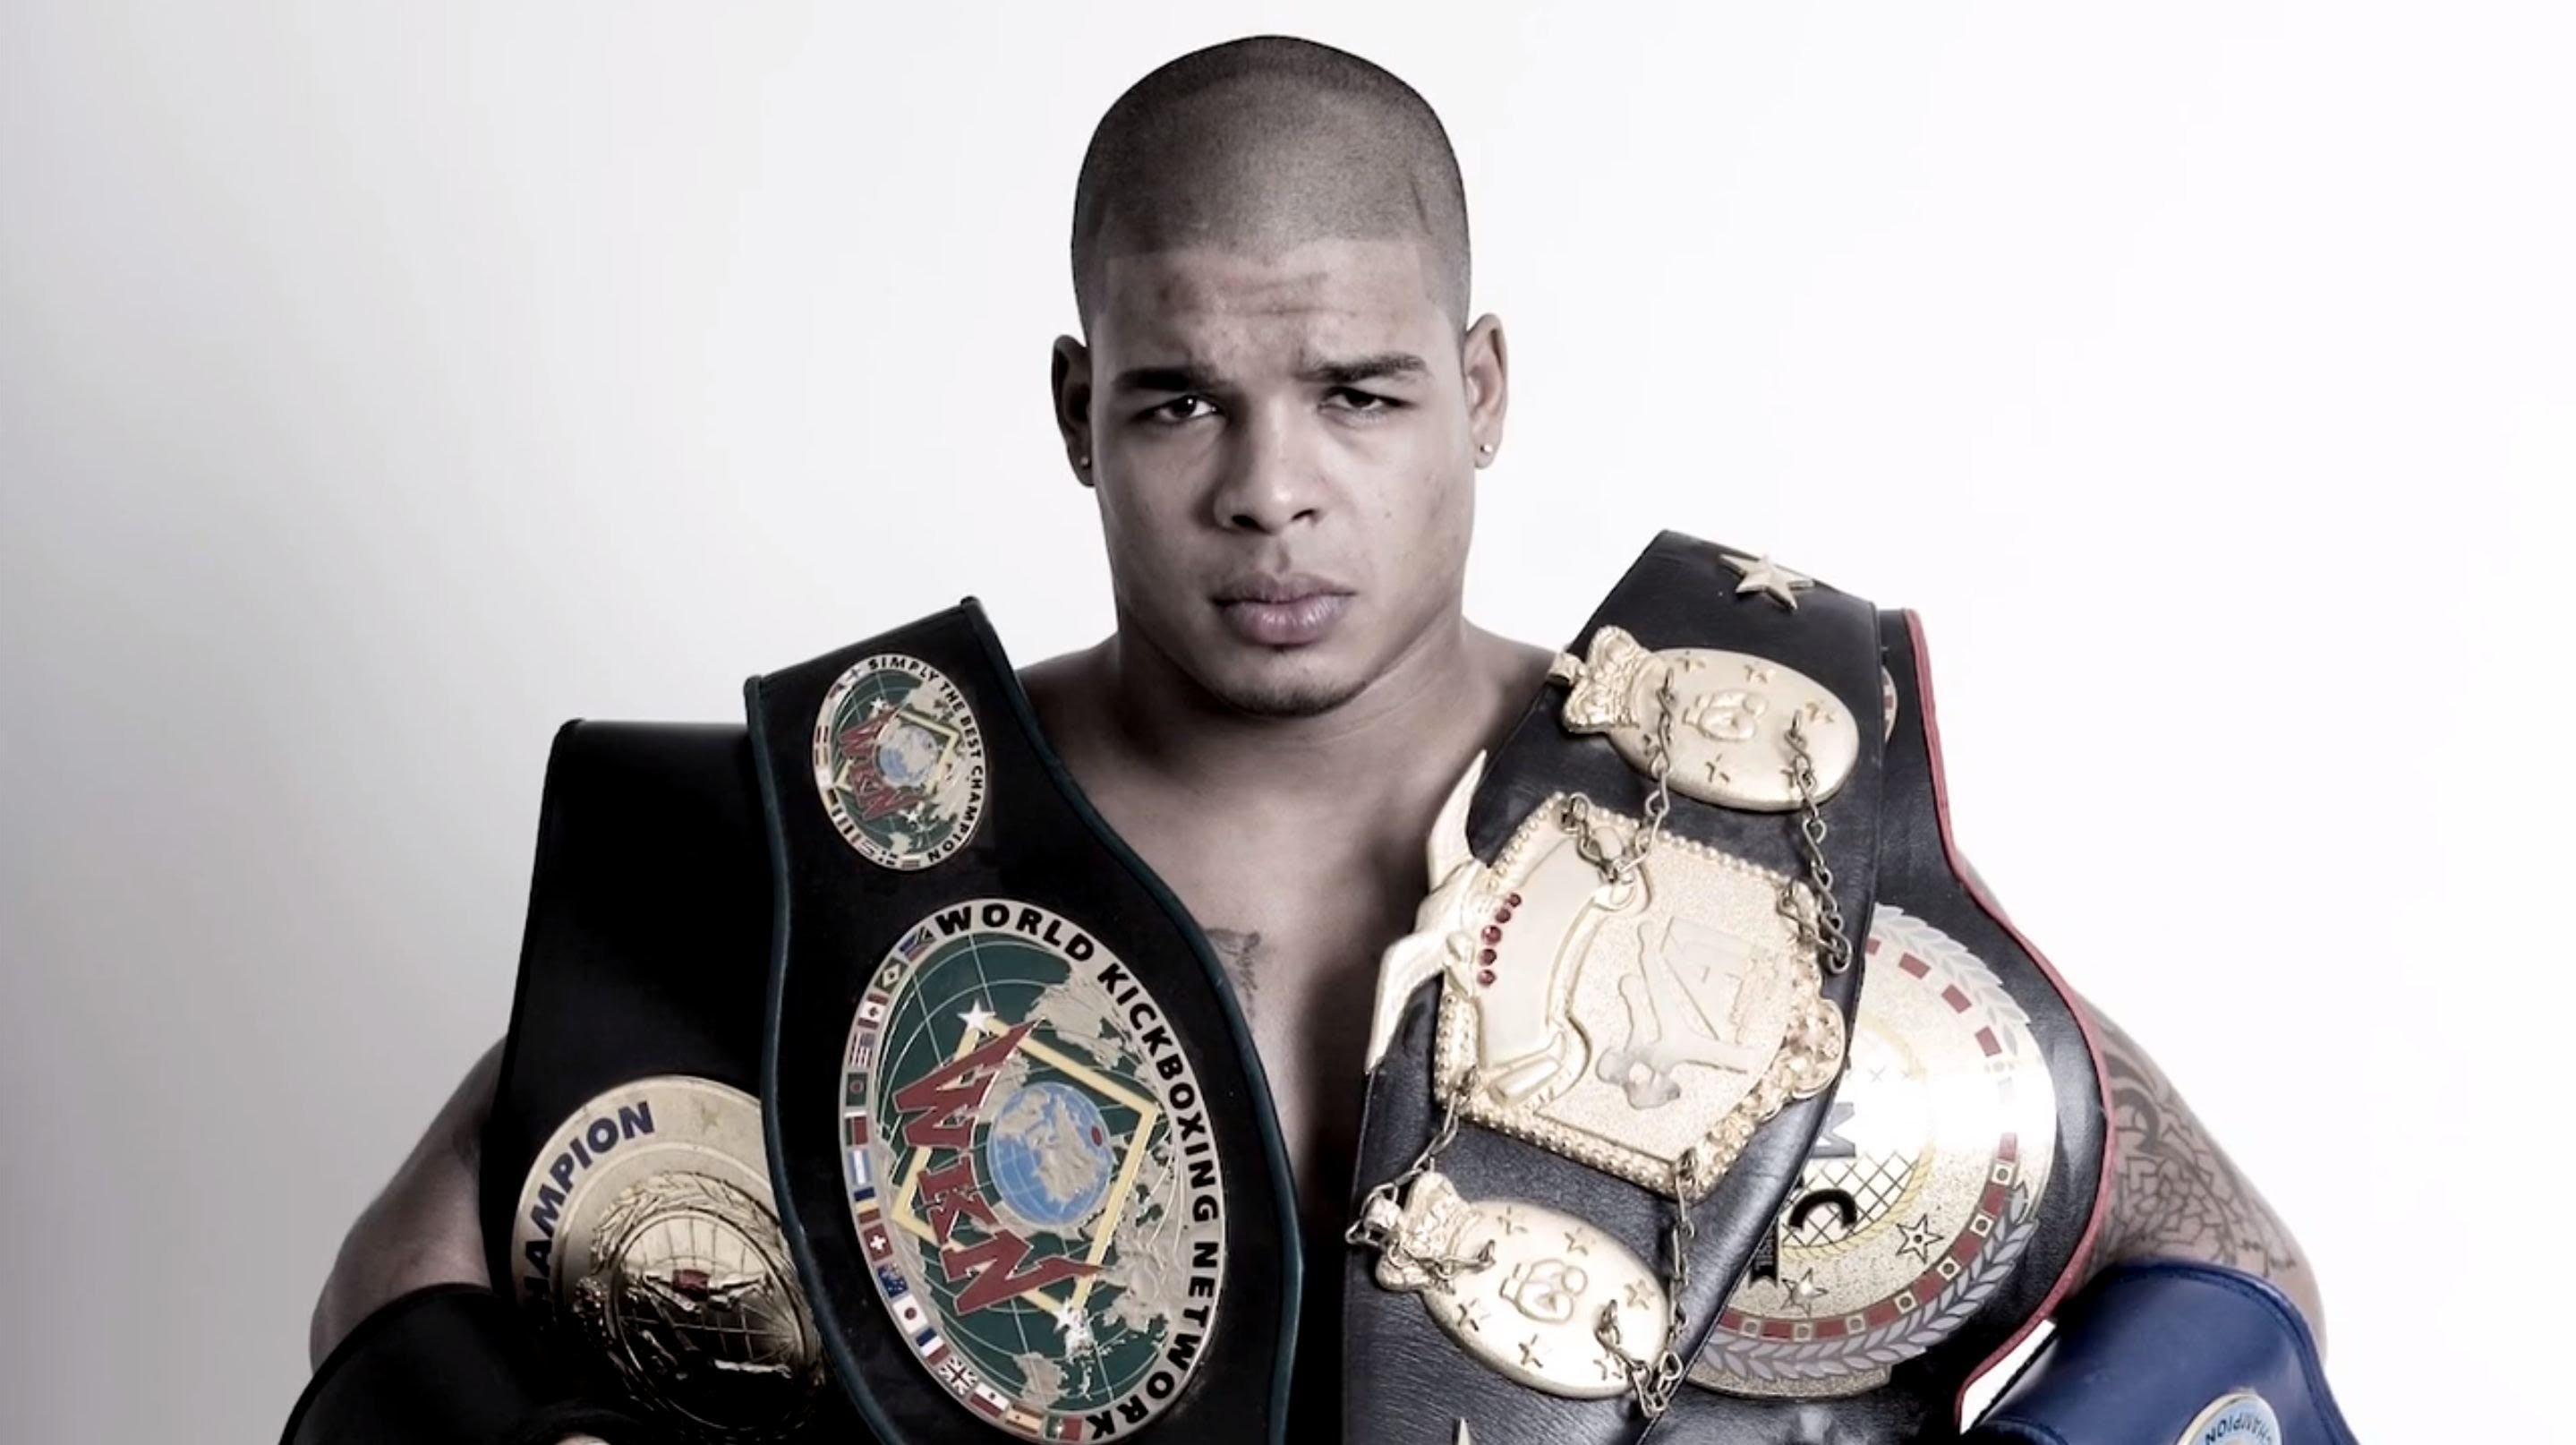 Kickboxing world champion: Spong